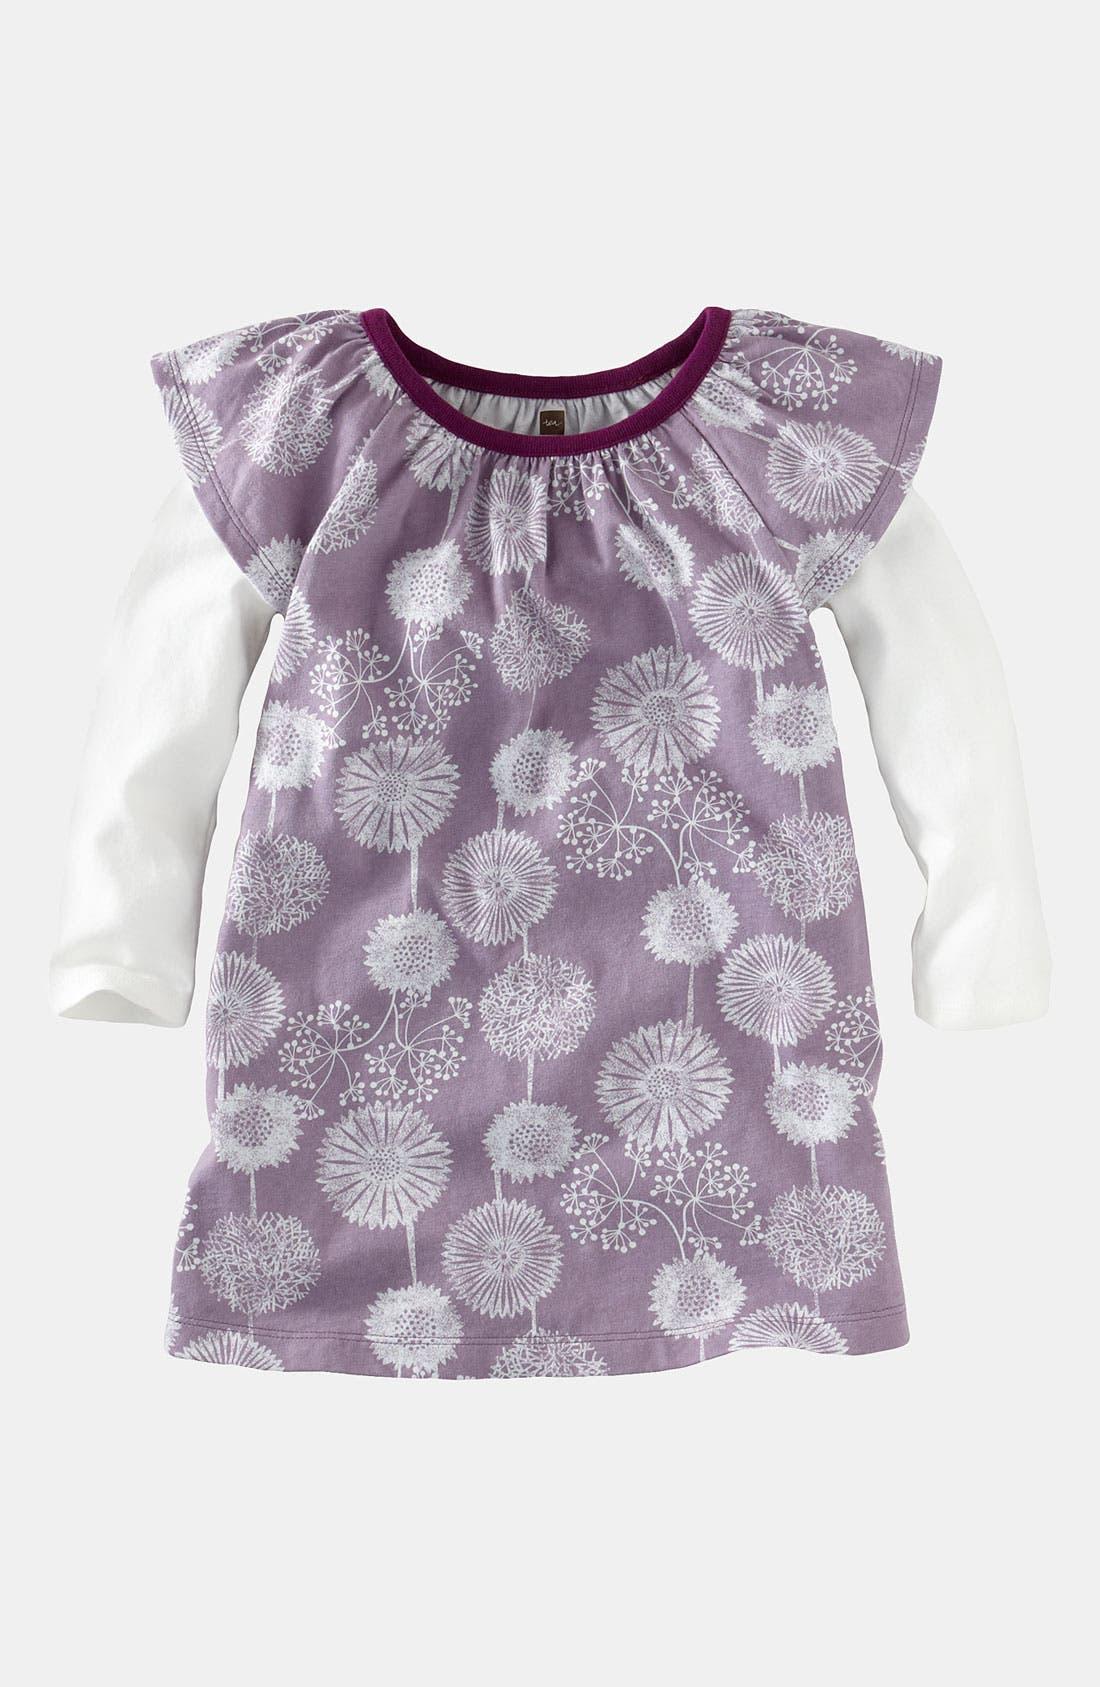 Main Image - Tea Collection 'Svenska Wildflower' Layered Sleeve Dress (Toddler)